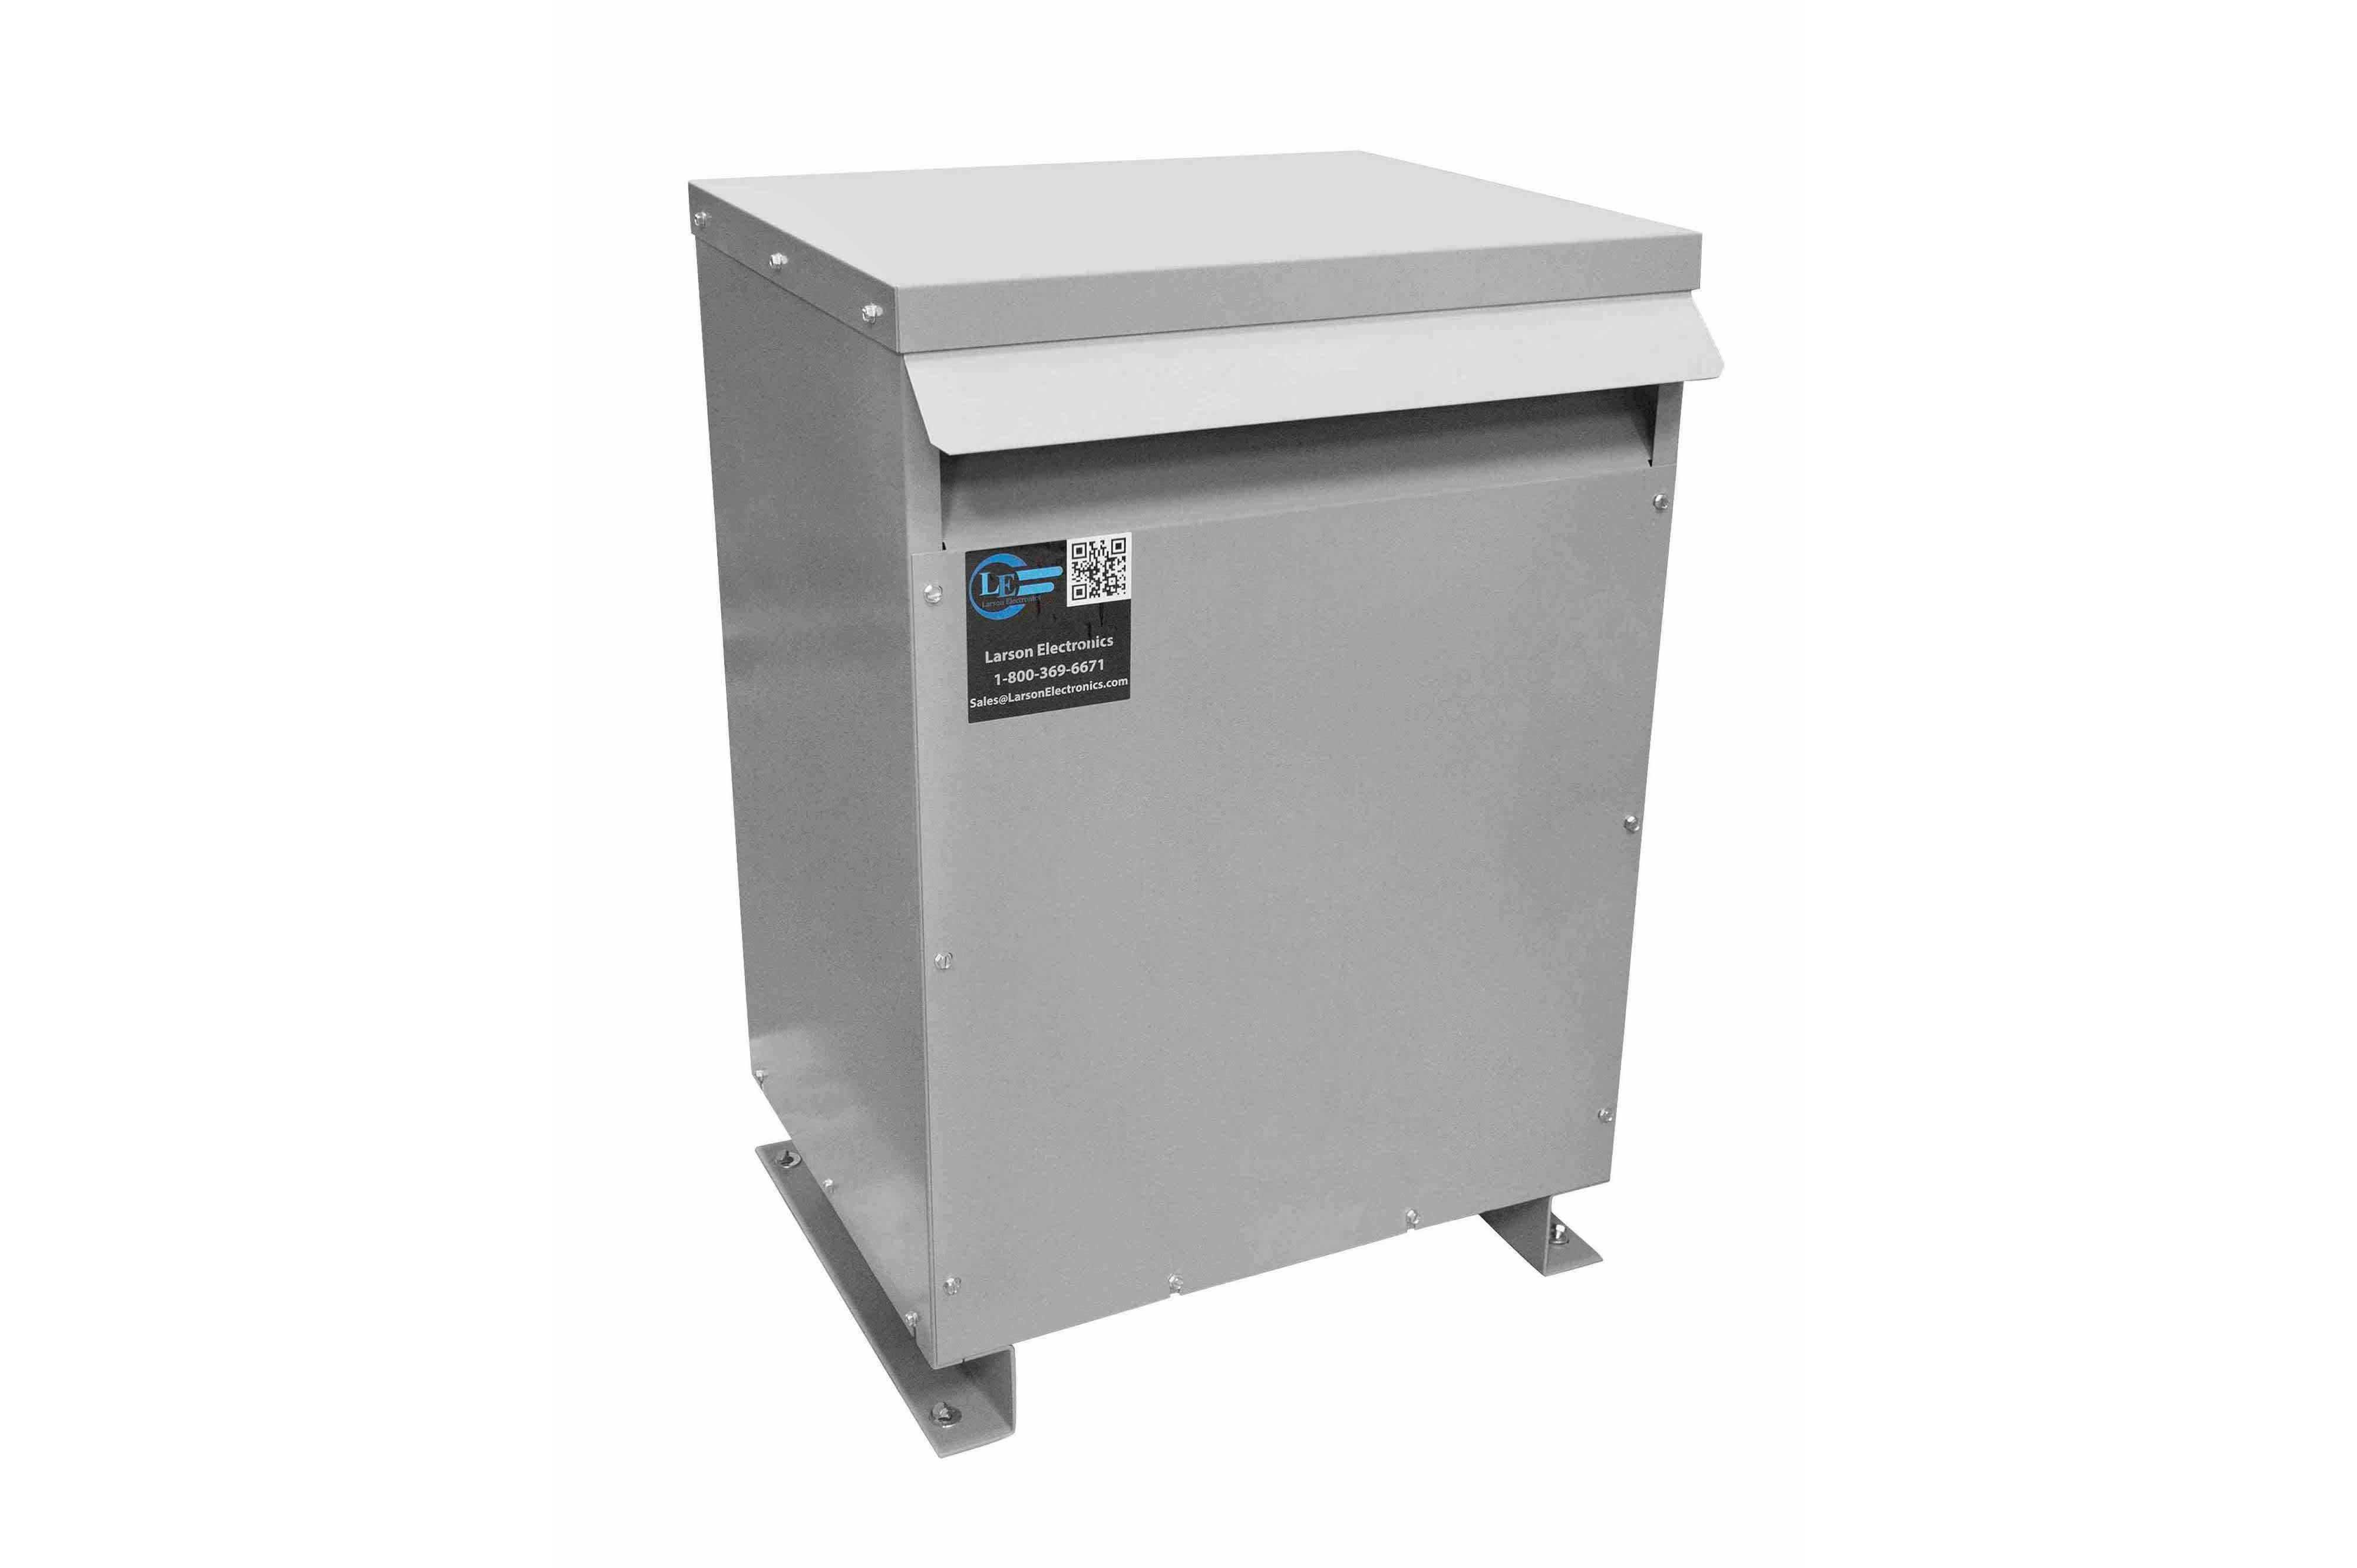 800 kVA 3PH DOE Transformer, 208V Delta Primary, 380Y/220 Wye-N Secondary, N3R, Ventilated, 60 Hz